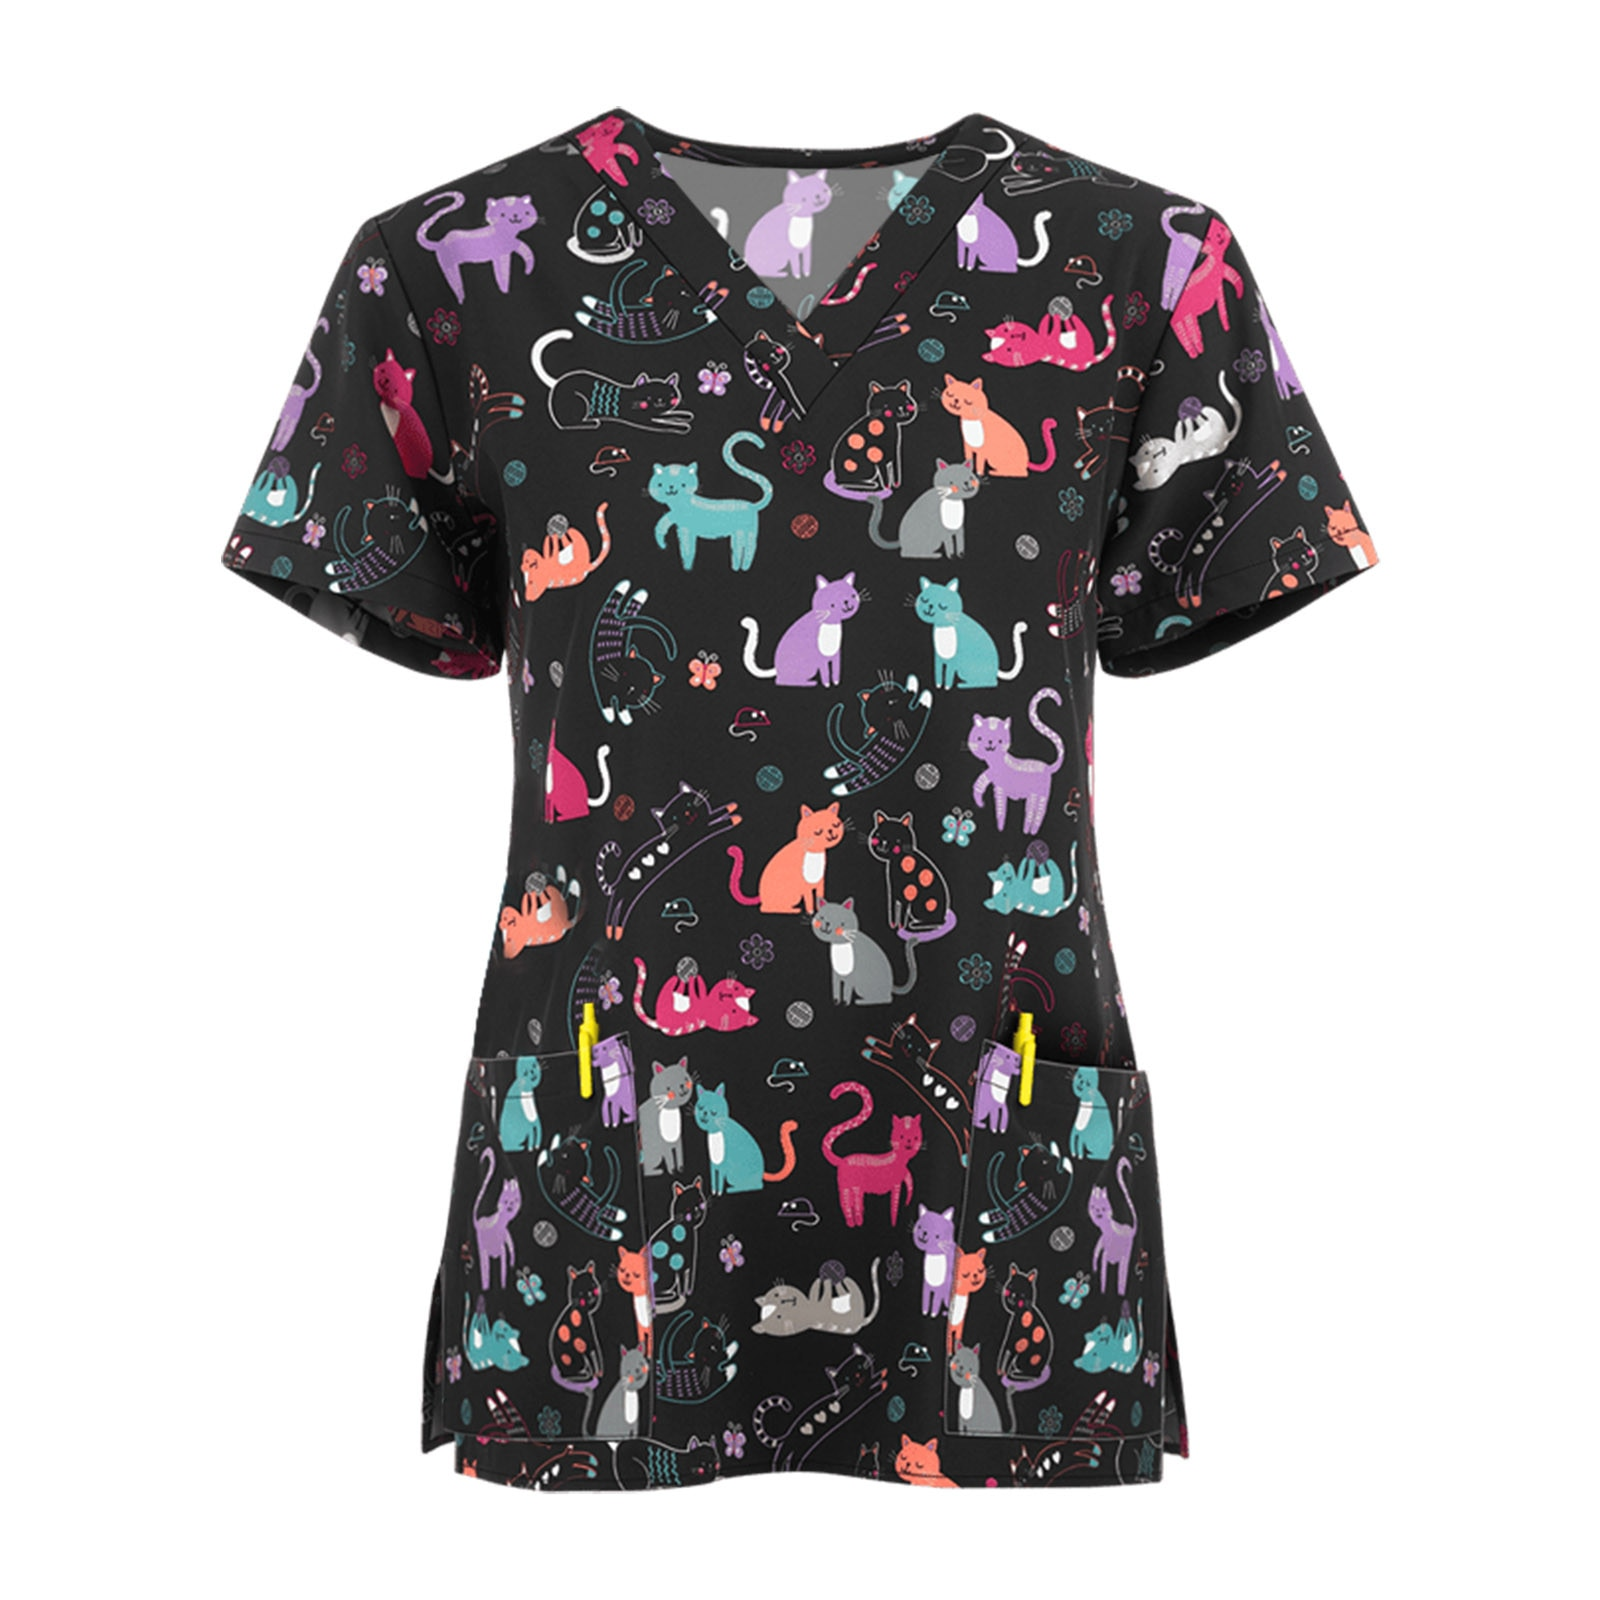 Nurse Uniform Workwear T Shirt V-neck Cartoon Printing Short  Sleeve Tops Pocket Shirt Breathable Pharmacy Nursing Uniform pharmacy